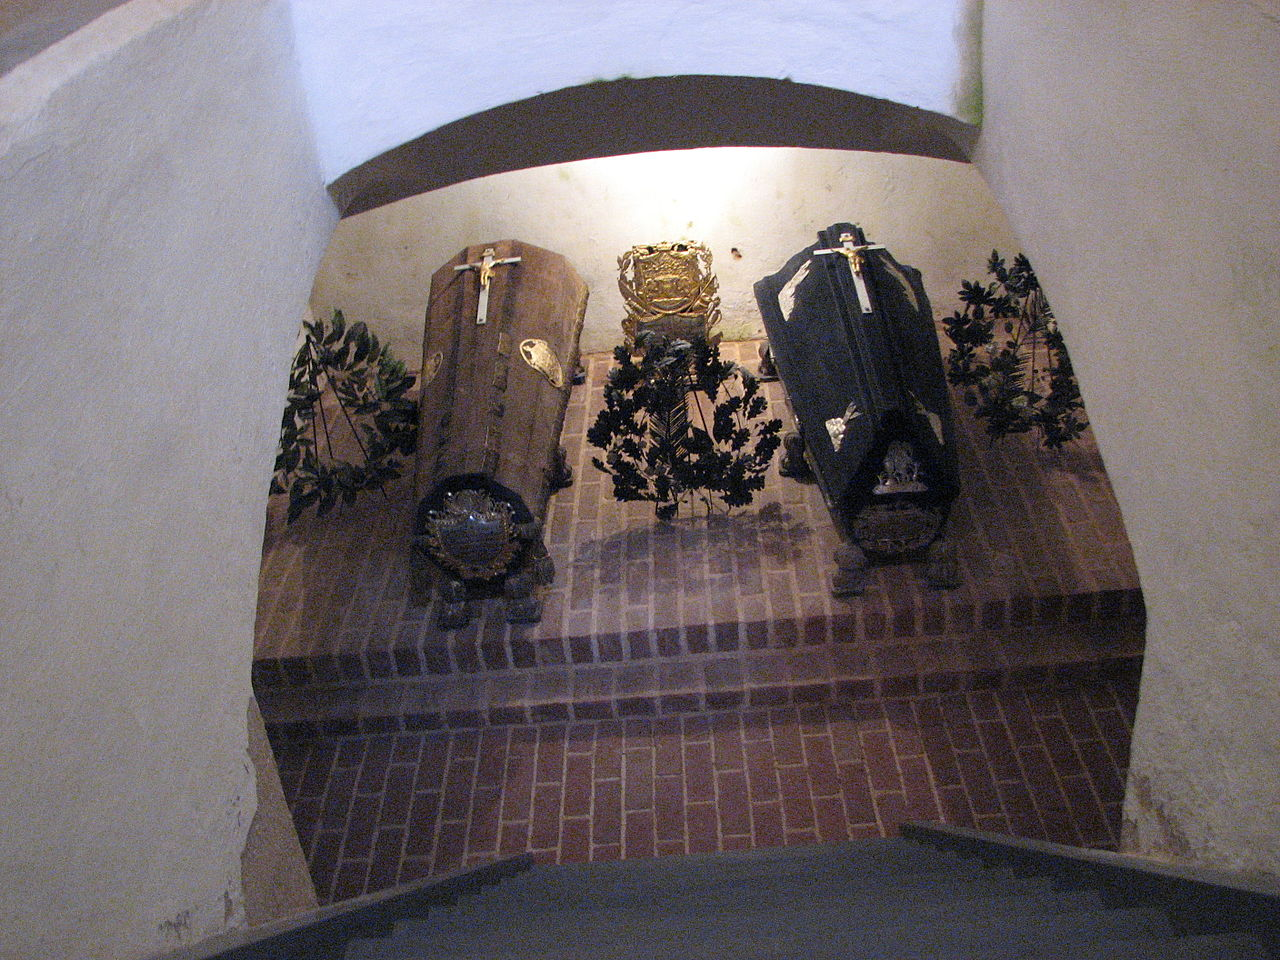 Barclay de Tolly mausoleum3.jpg